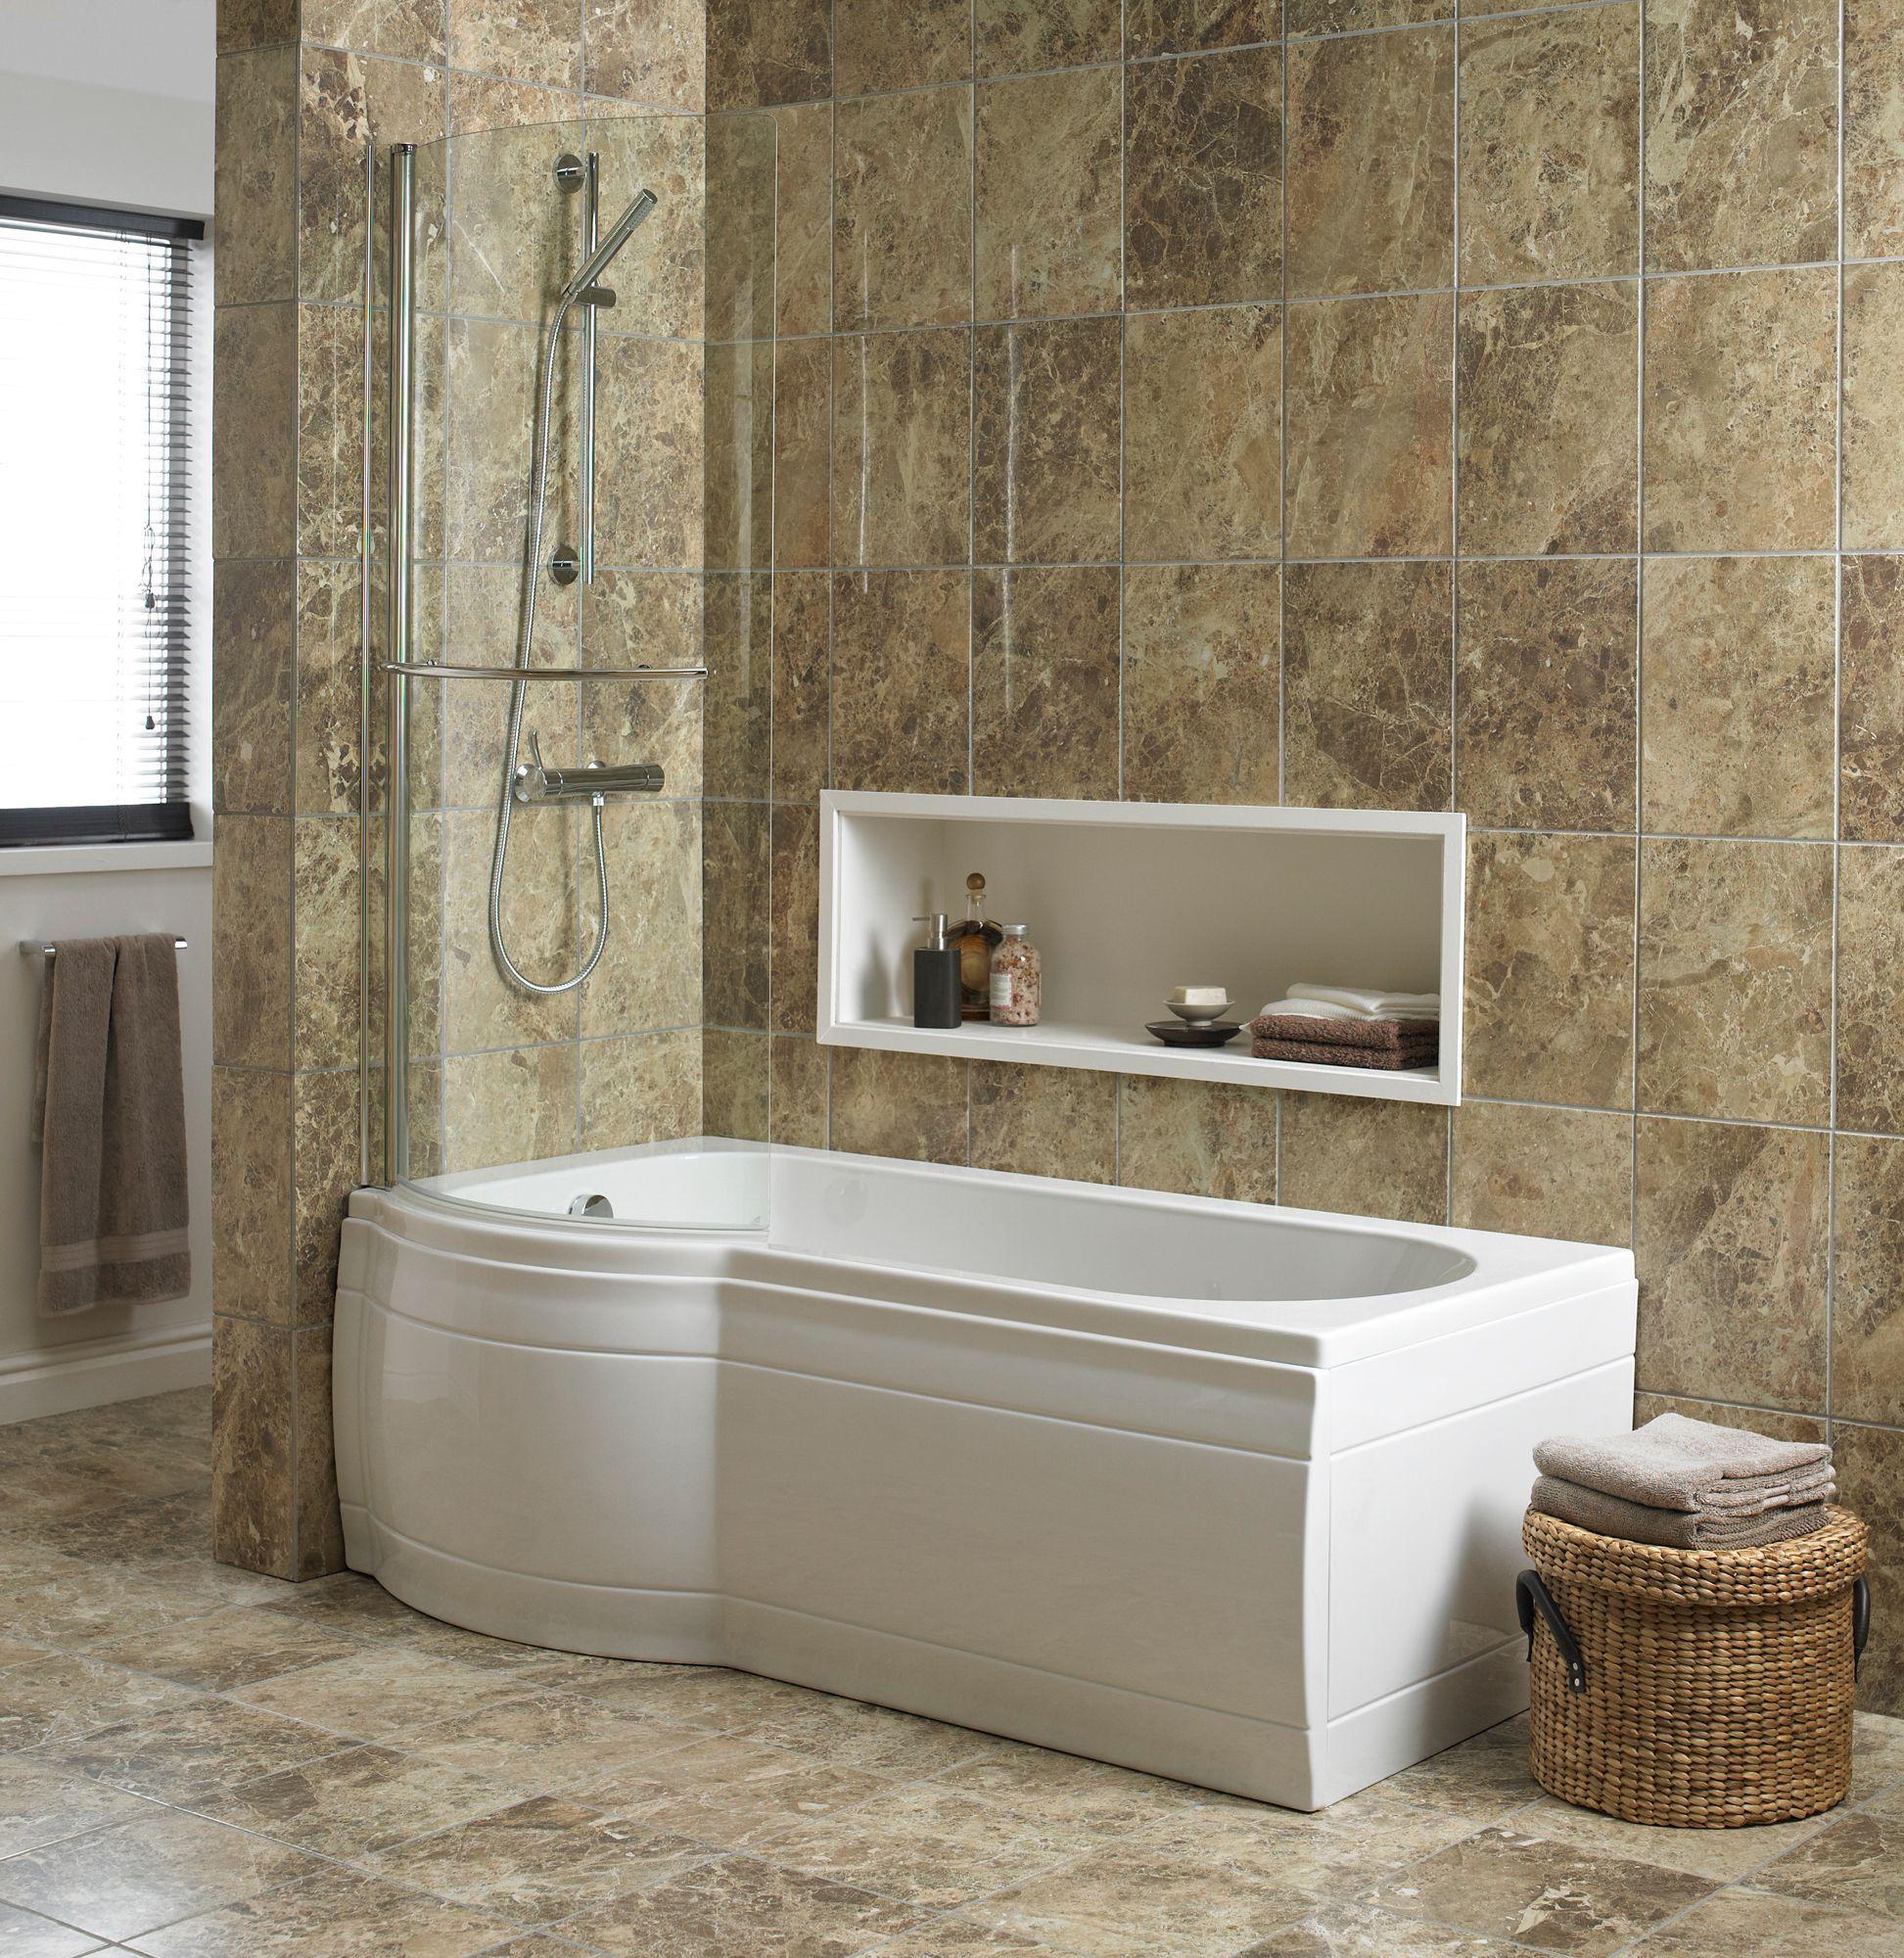 Diy And Crafts Bath Screens And Bath On Pinterest Awesome B And Q Bathroom Design Design Decoration